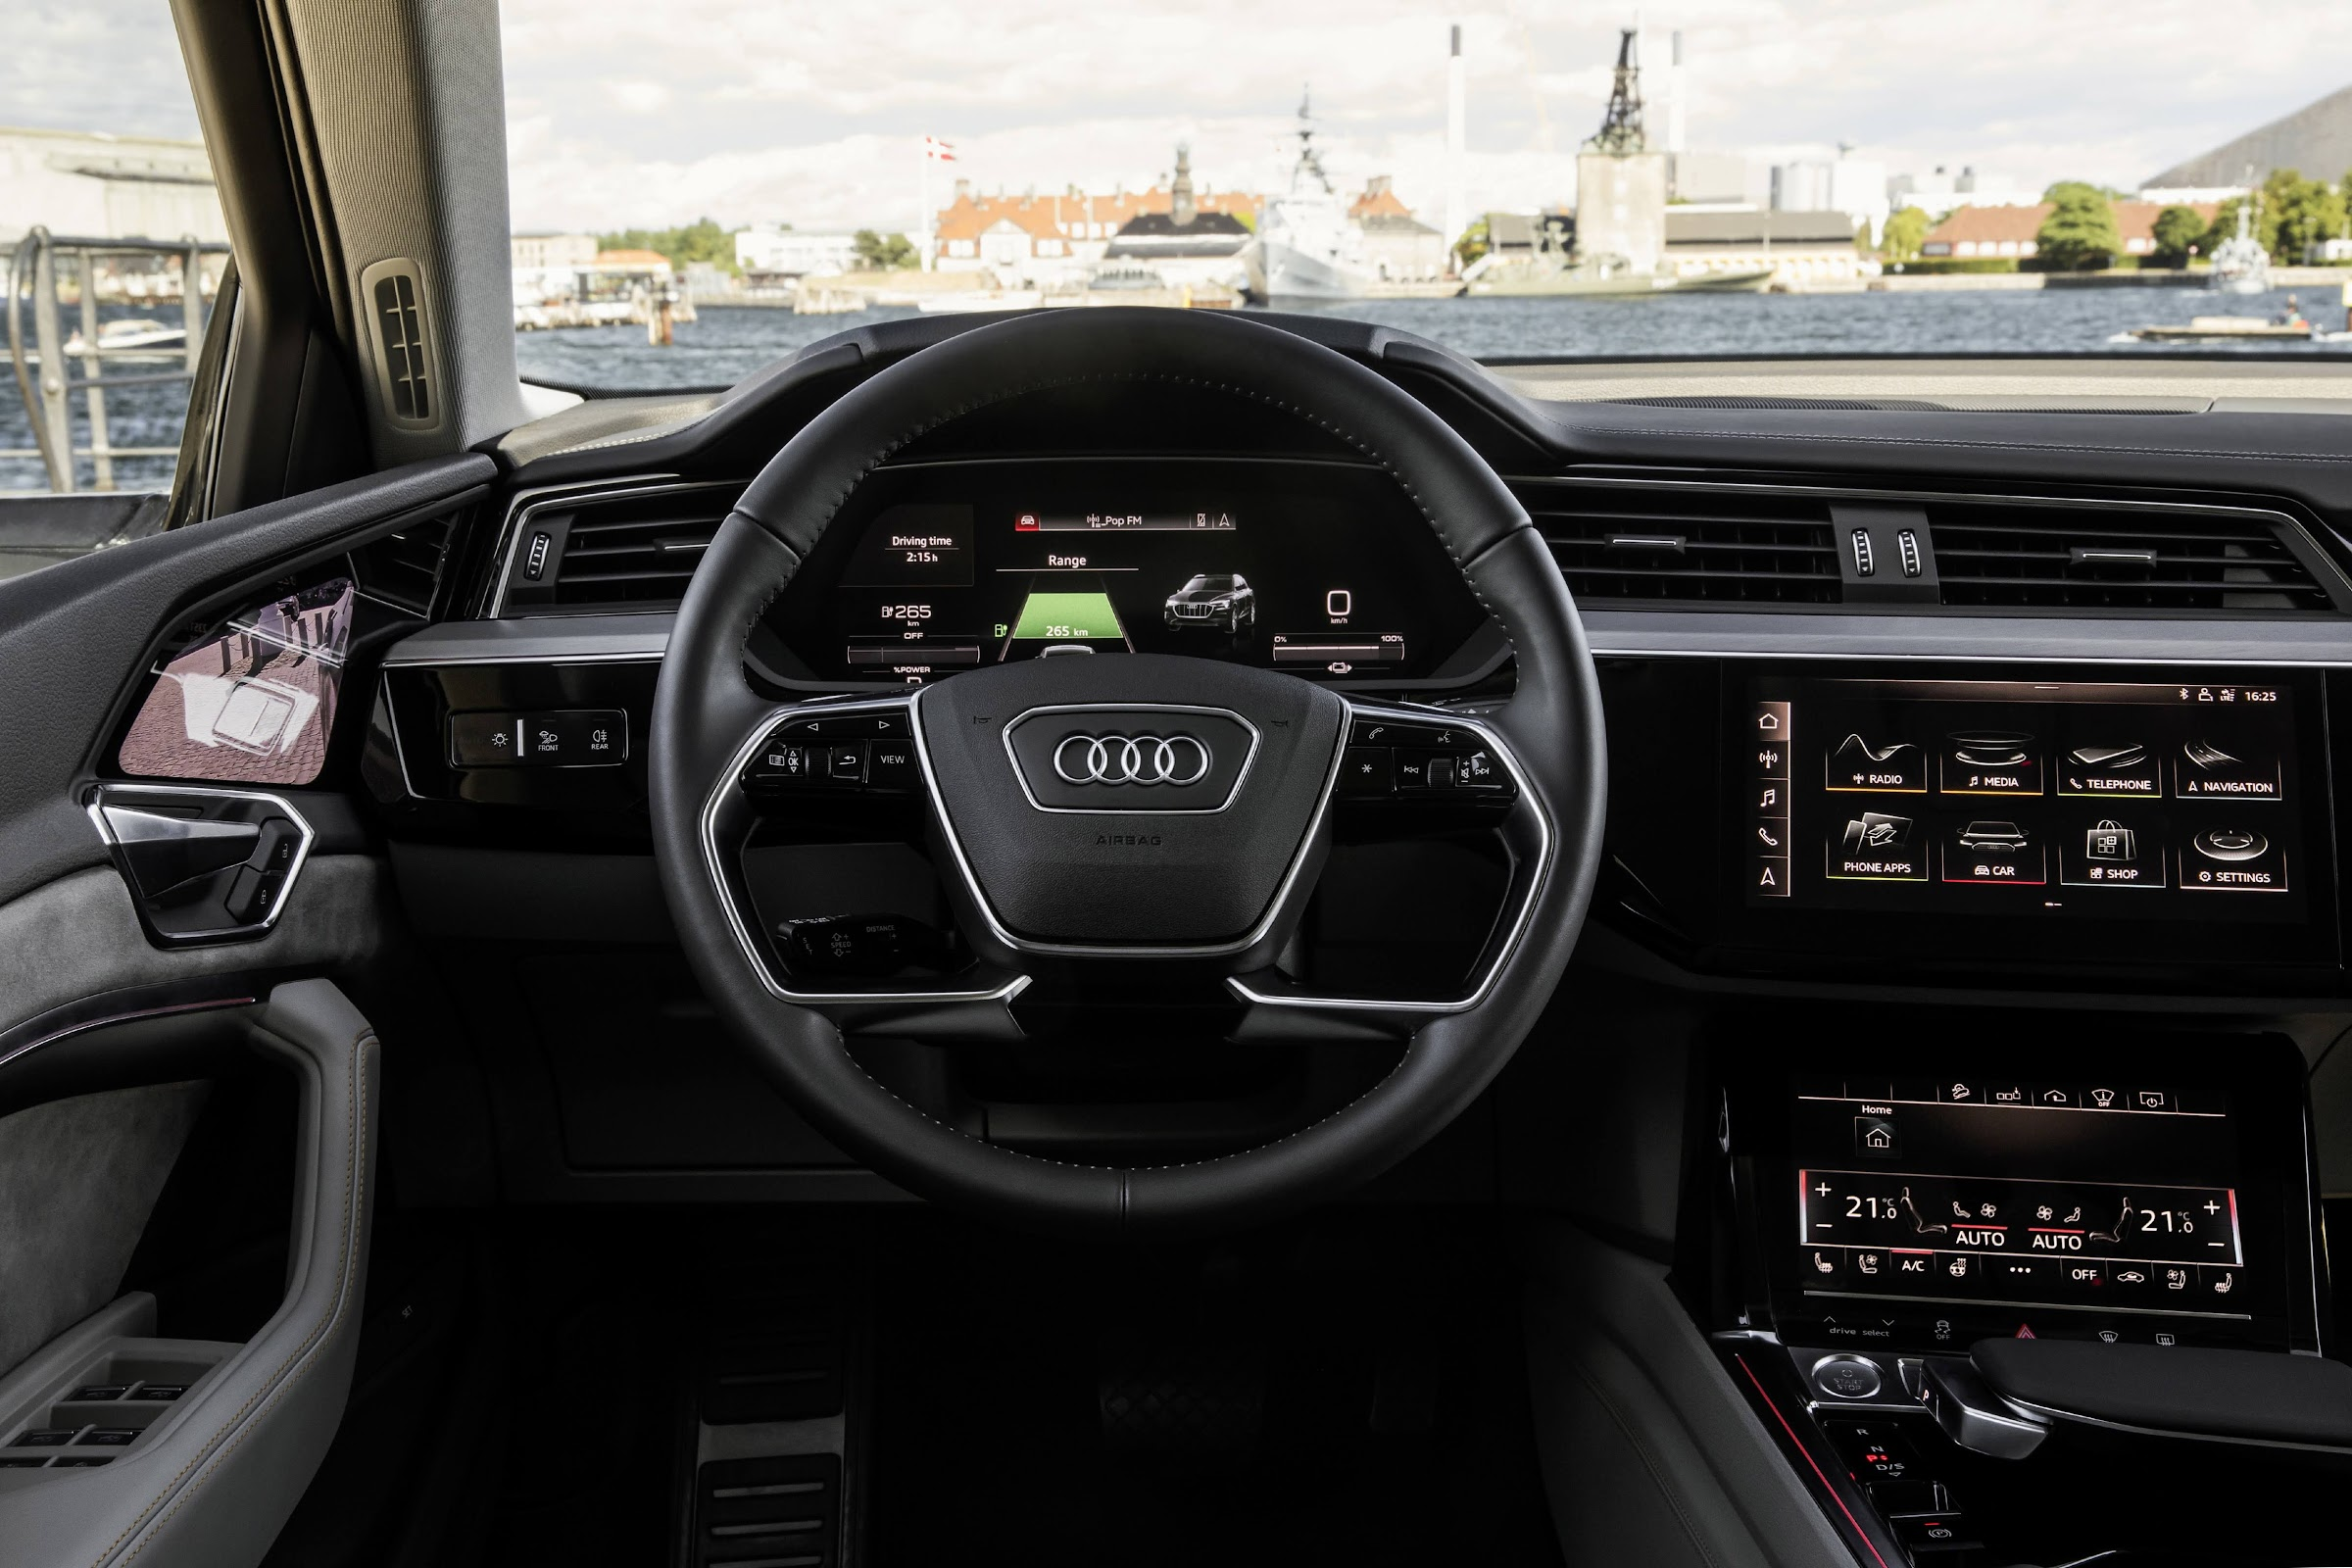 Ney2NfcrFezzd JzQc22k6yvBlQ 6URfdmDPBM7vWEJkO4gRLxnkjoovEotkzbf7PvQwgnj3tXBYmJHVEsmCLZalPBaFMA9cJz0xNdNYZIAF9xLNTLtjgY1VSgdOs1zE45 Pp NPyA=w2400 - Así es el interior del Audi e-tron quattro, pantallas por retrovisores